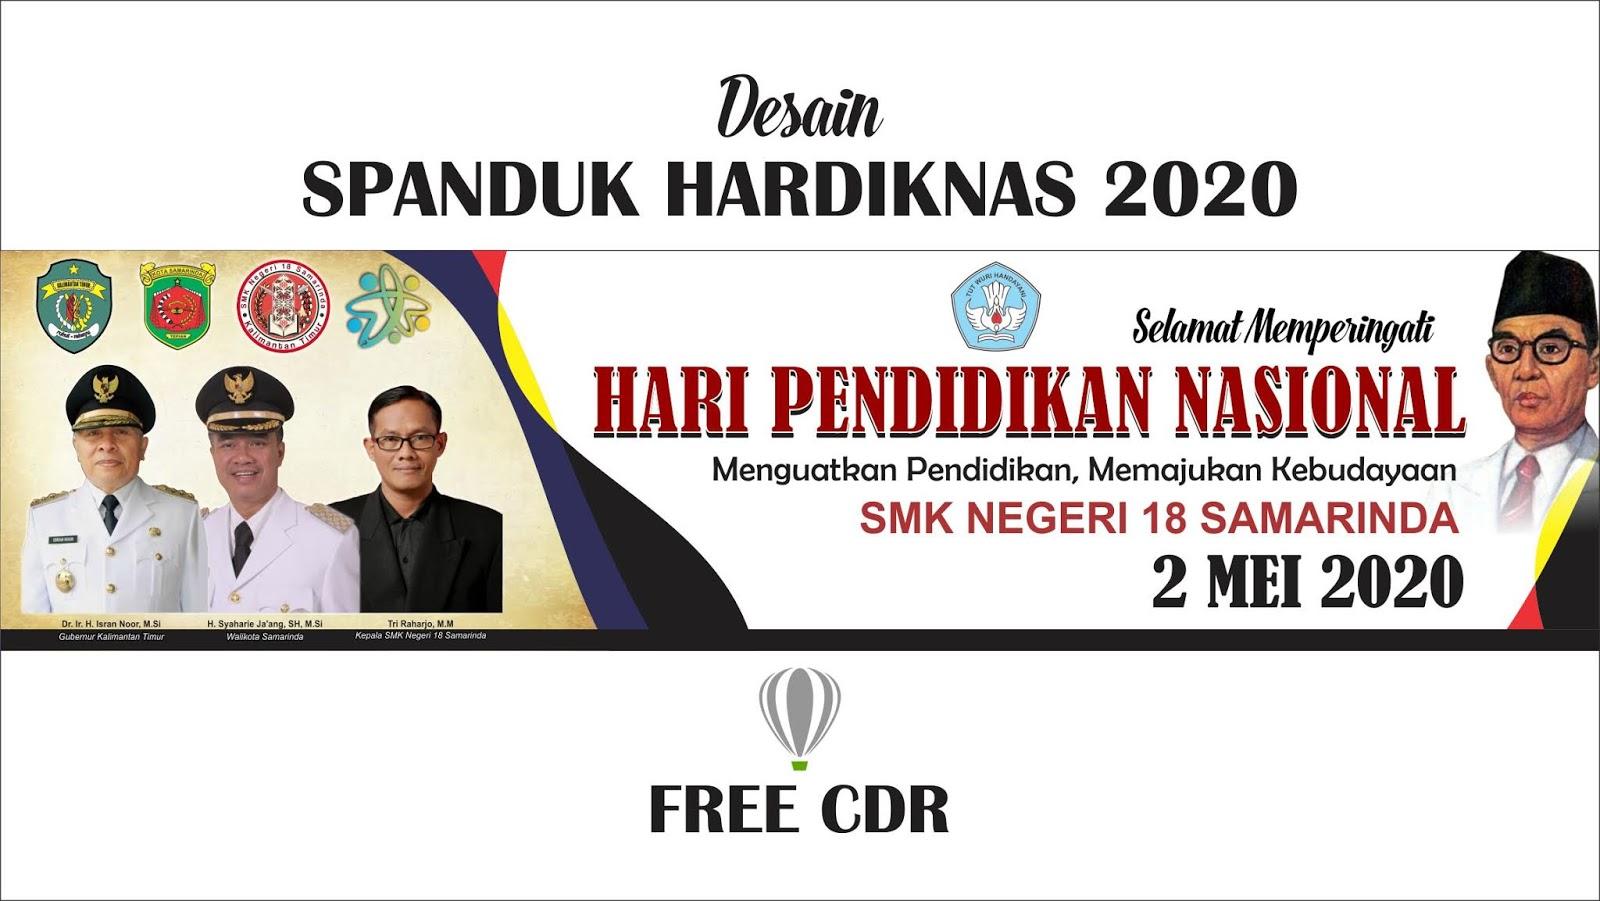 Desain Spanduk HARDIKNAS 2020 Format CorelDraw ( Free CDR